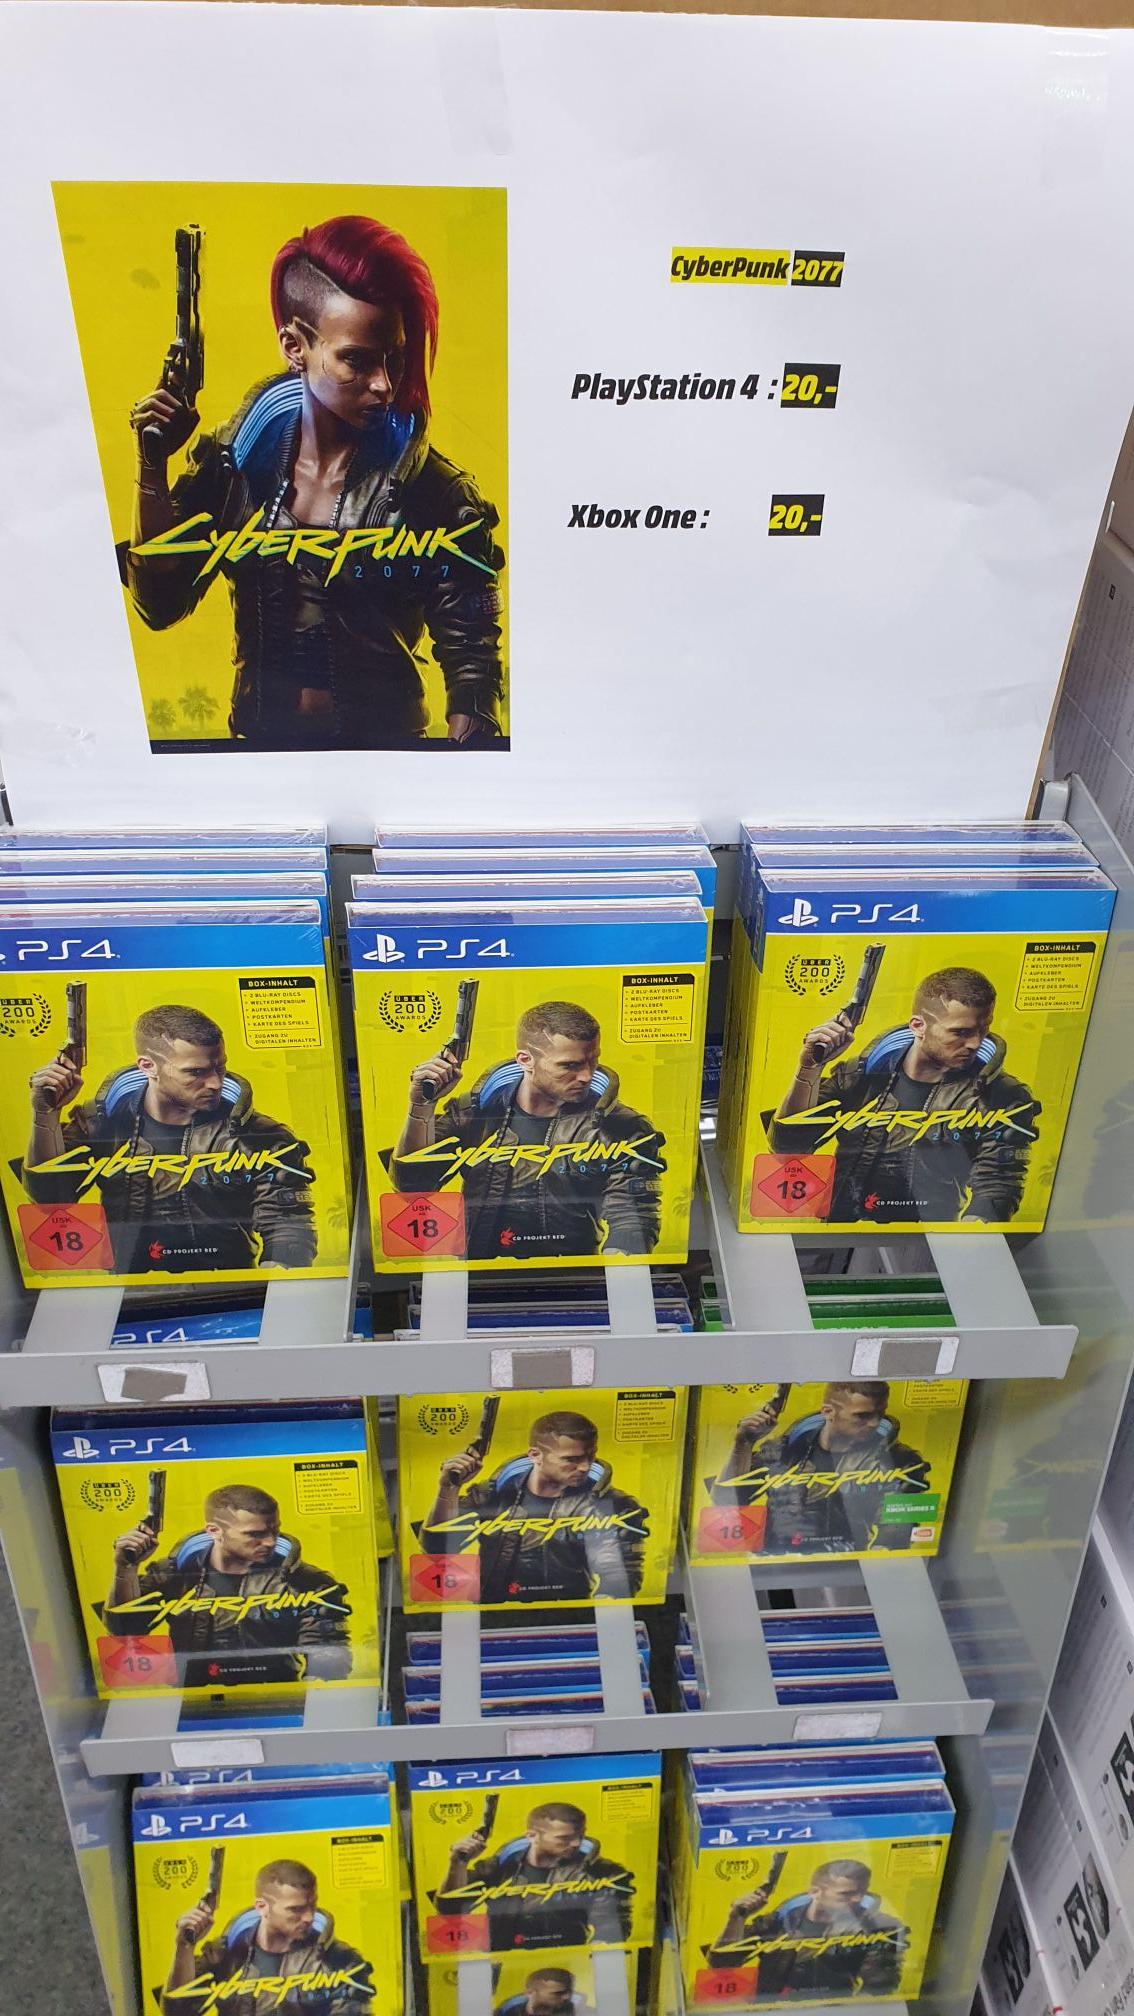 Cyberpunk 2077 Day 1 PS4 XBox Media Markt Lokal Wuppertal